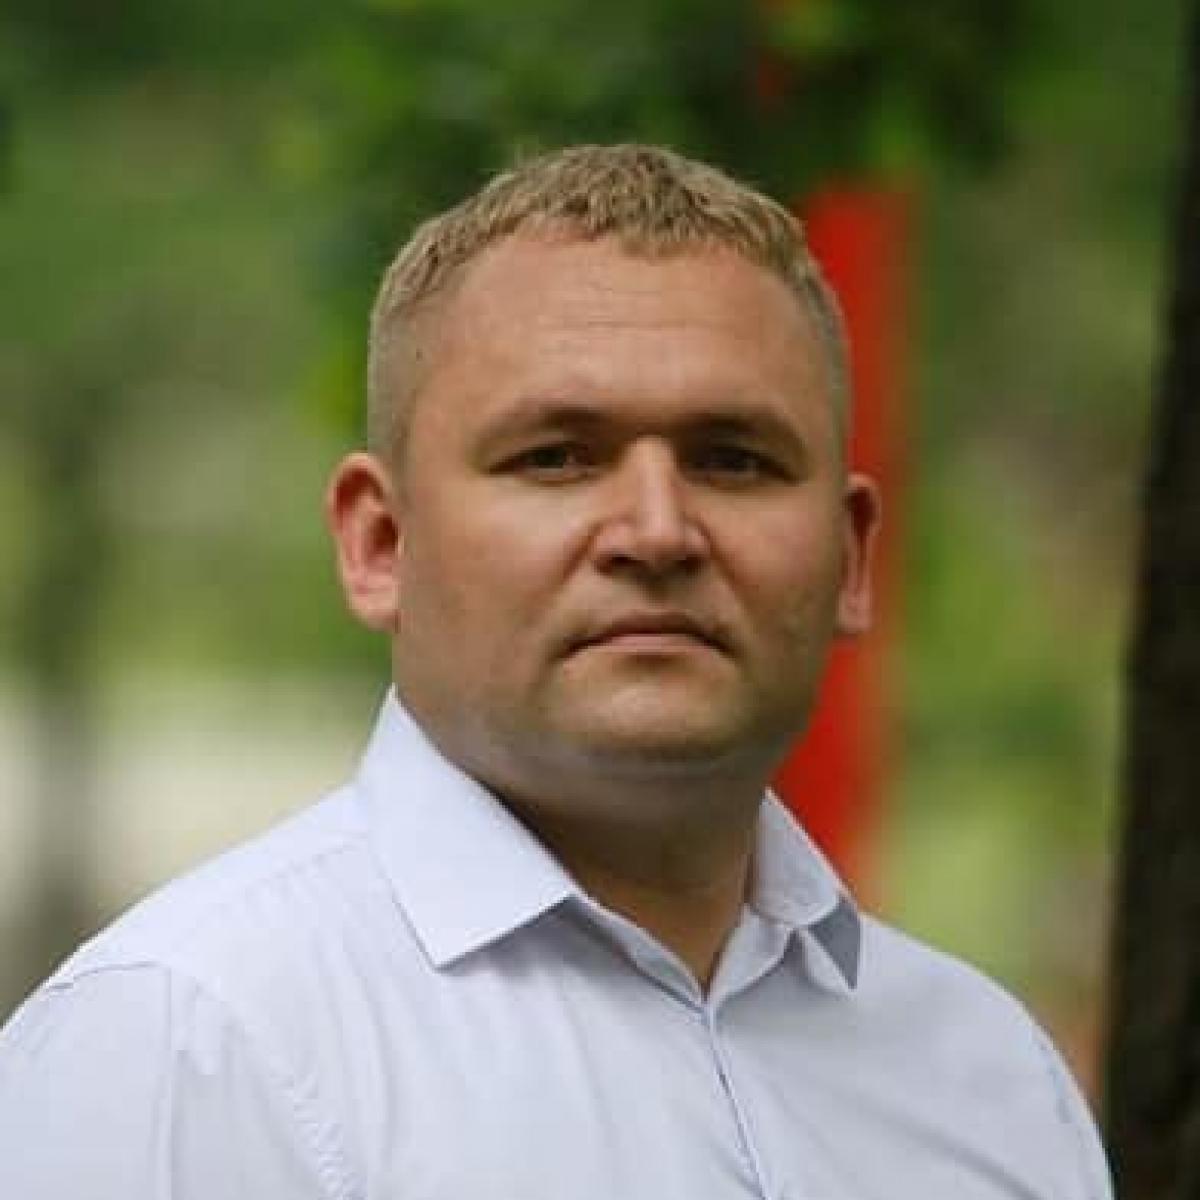 Головенко Антон Анатолійович